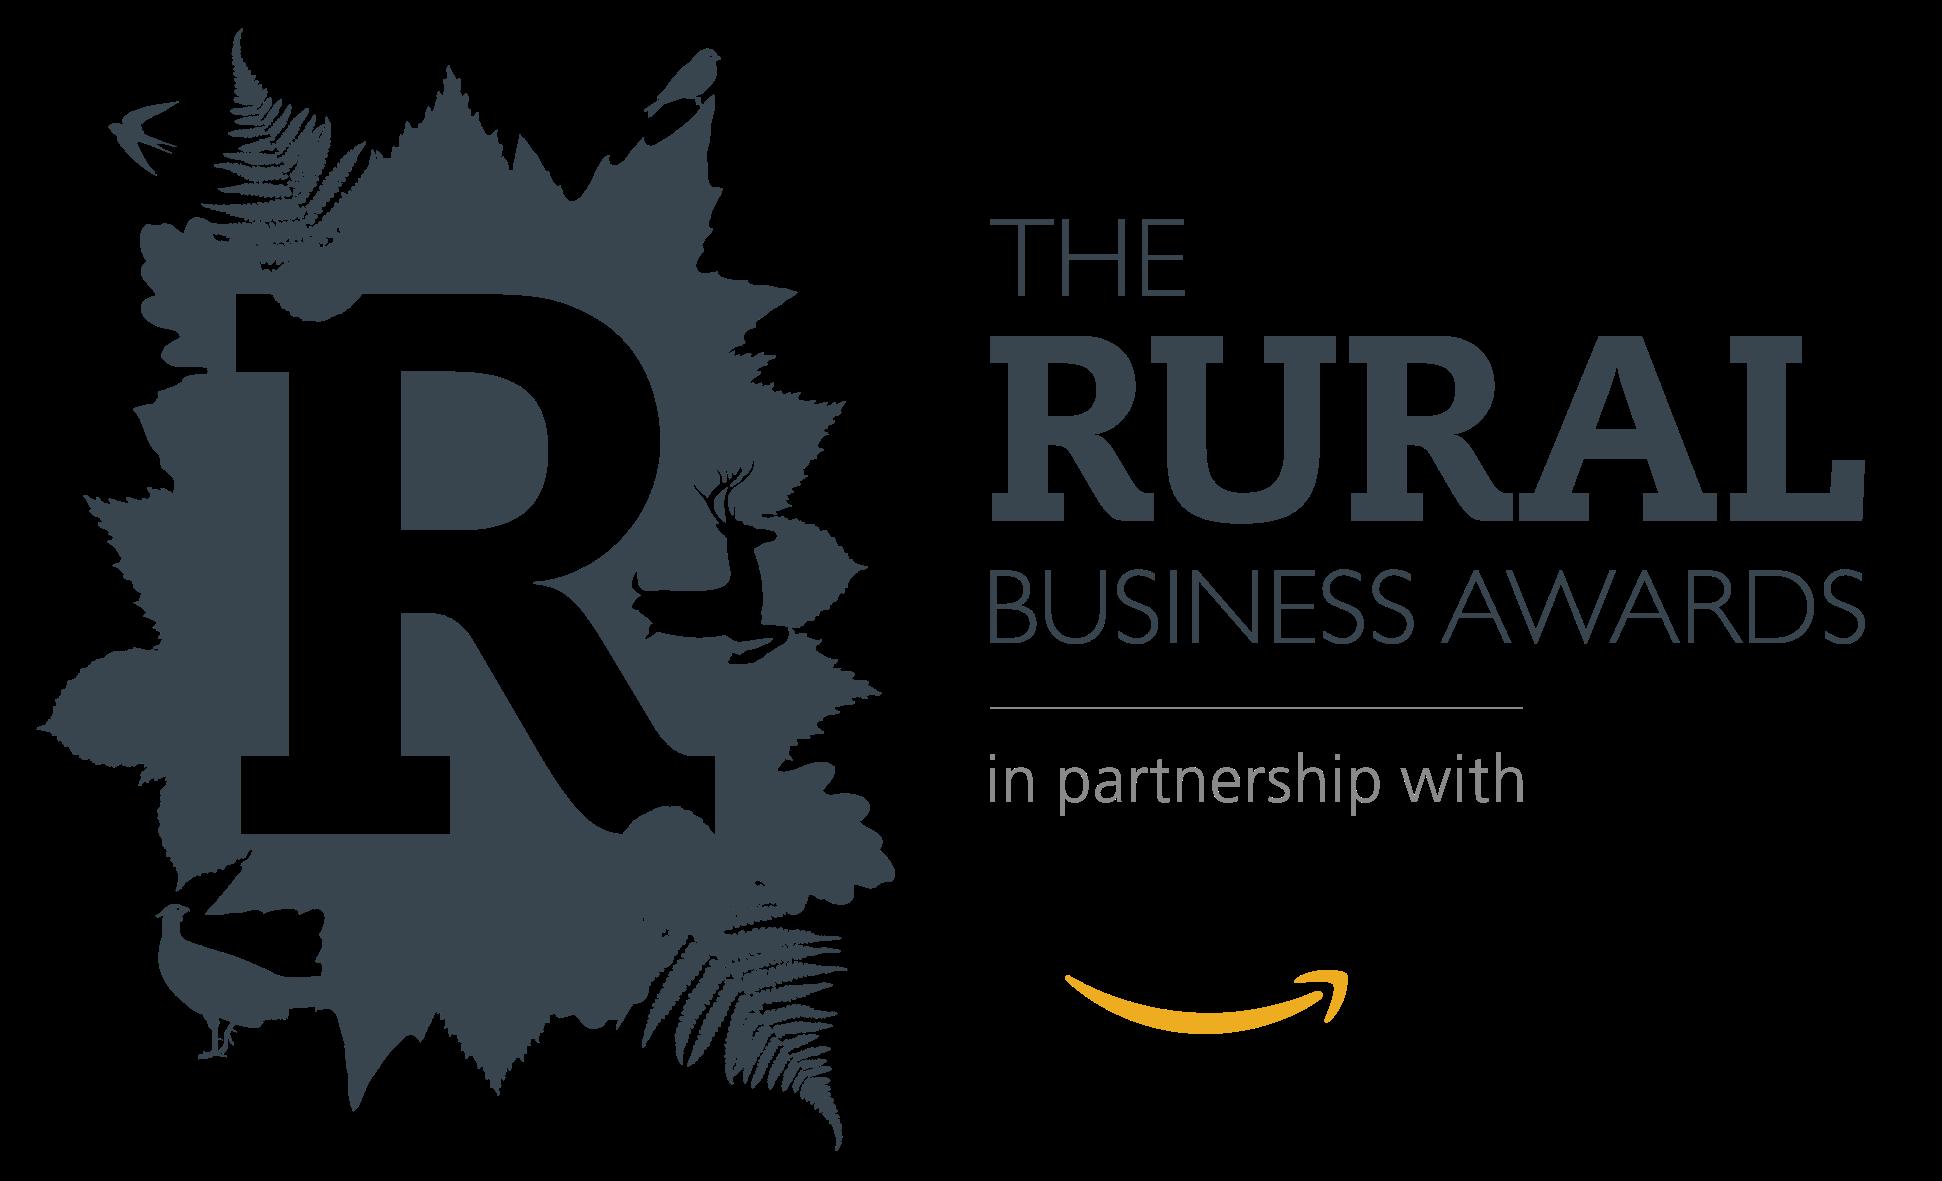 Woo hoo! We're a Rural Business Award Finalist